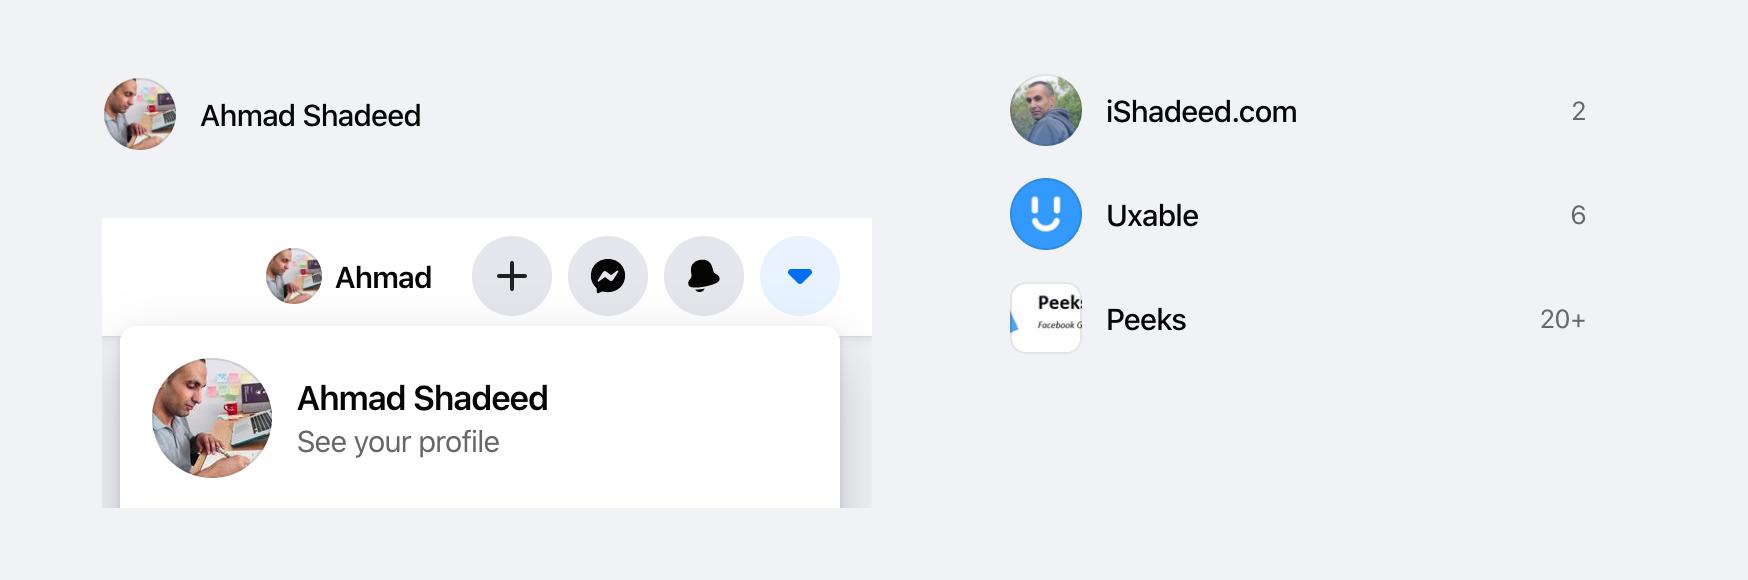 Аватары формата SVG